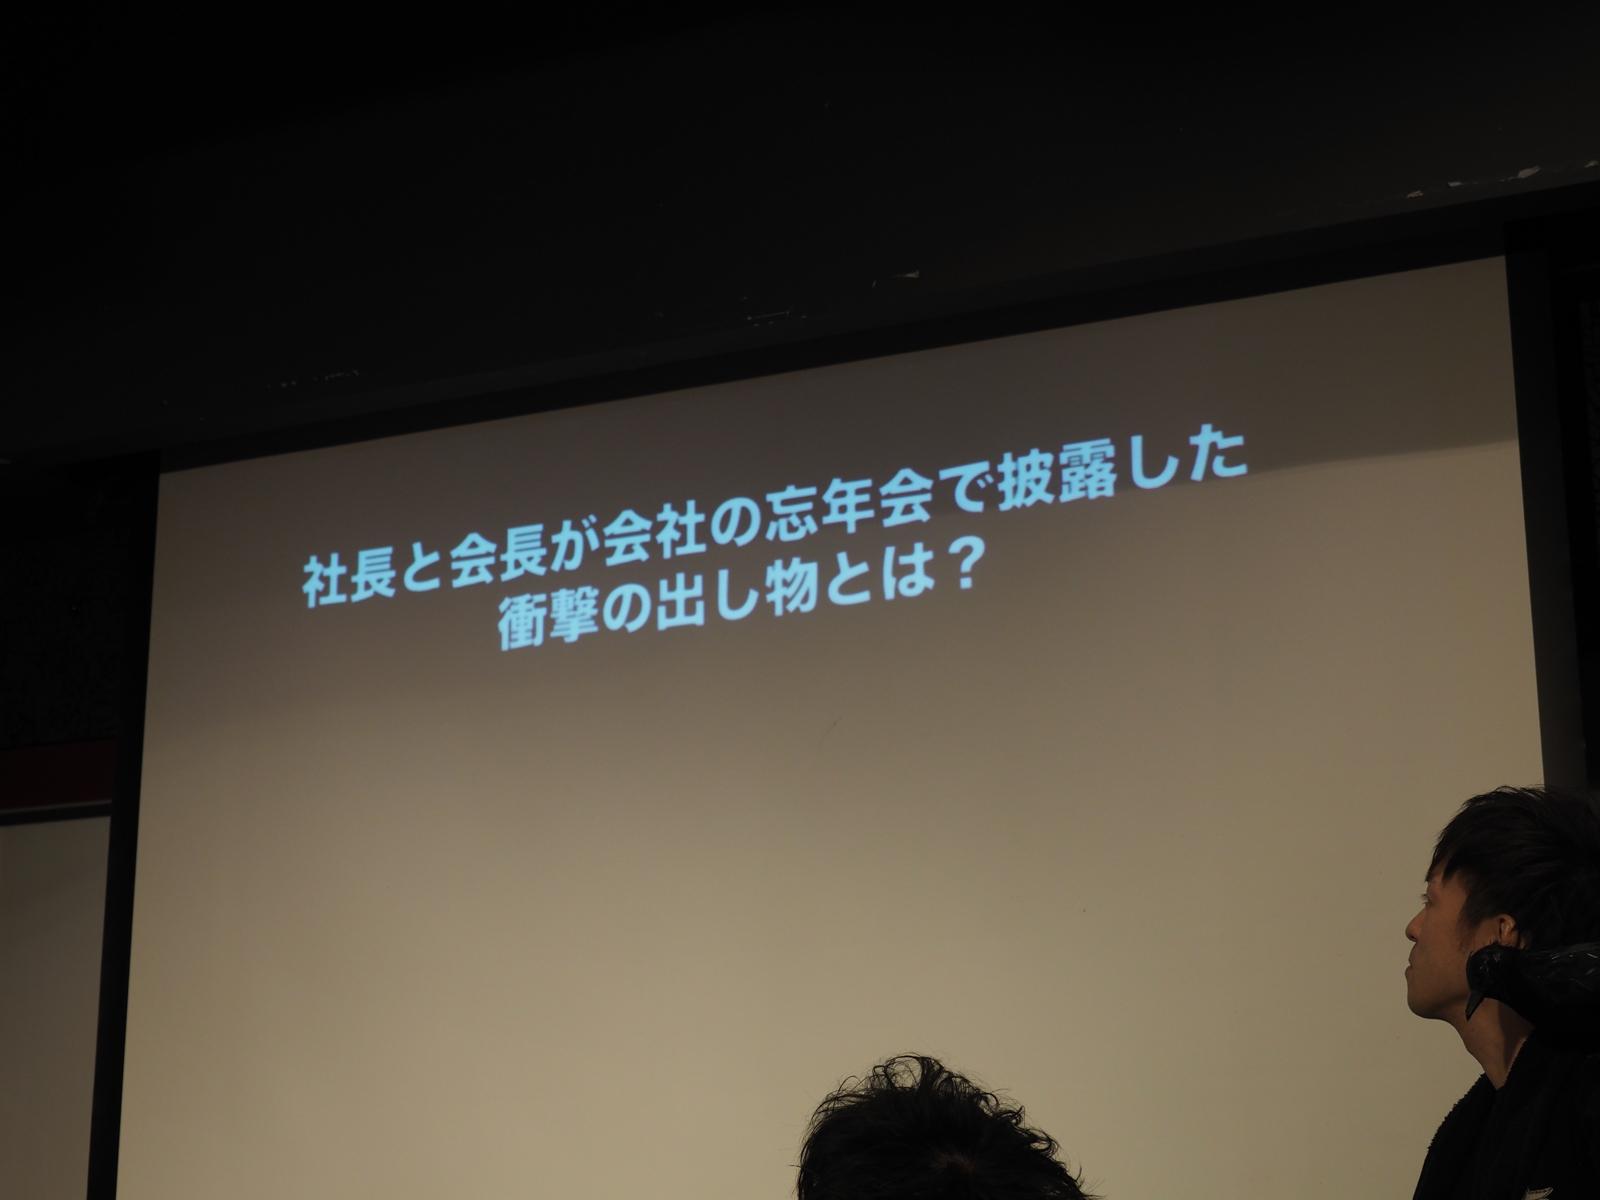 f:id:motomachi24:20170115163217j:plain